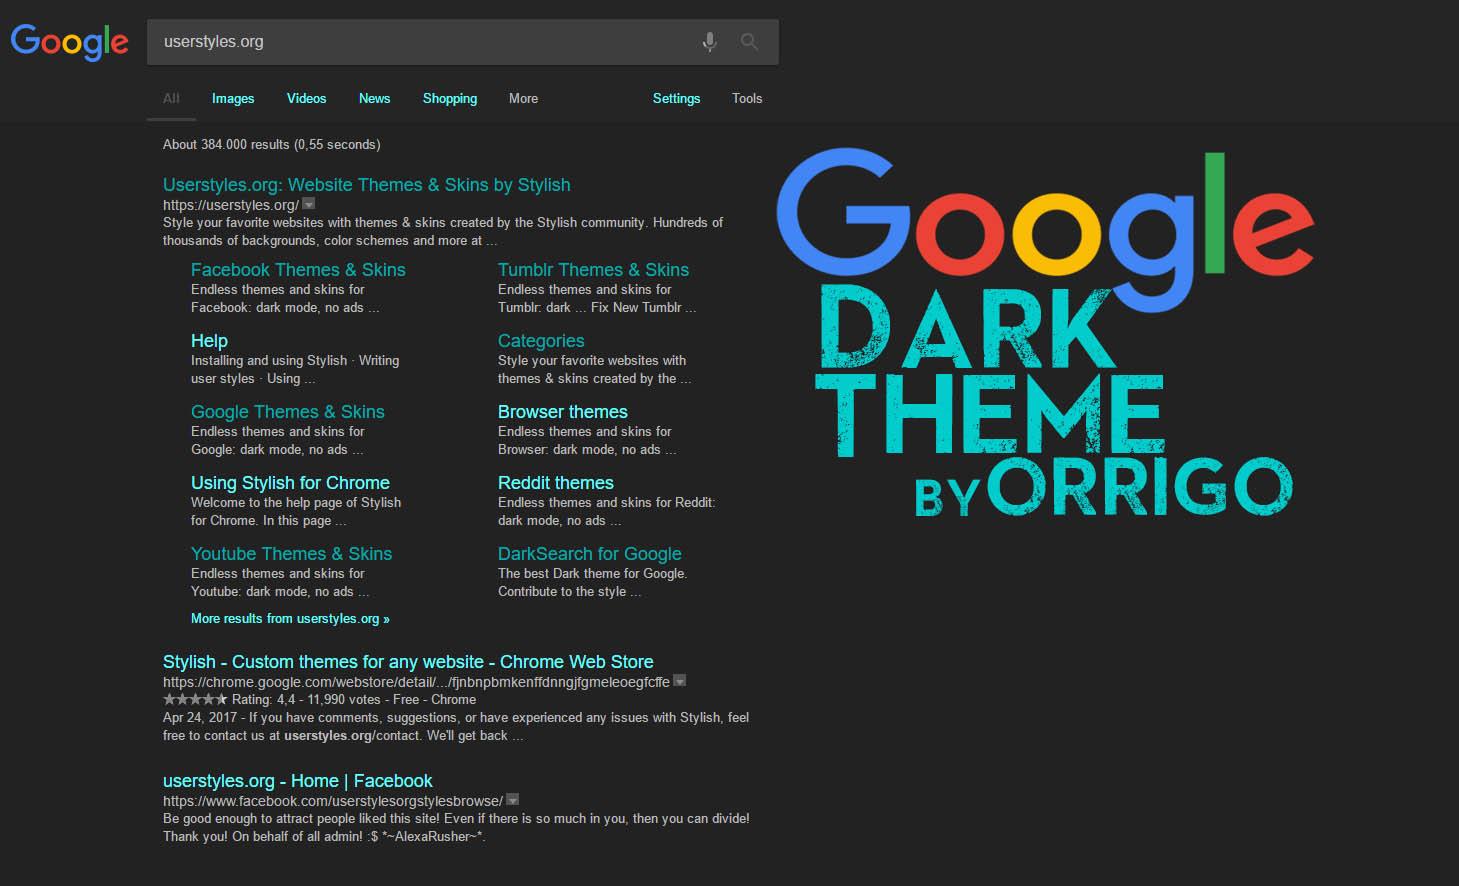 Google Dark Theme - OrriGo | Userstyles org